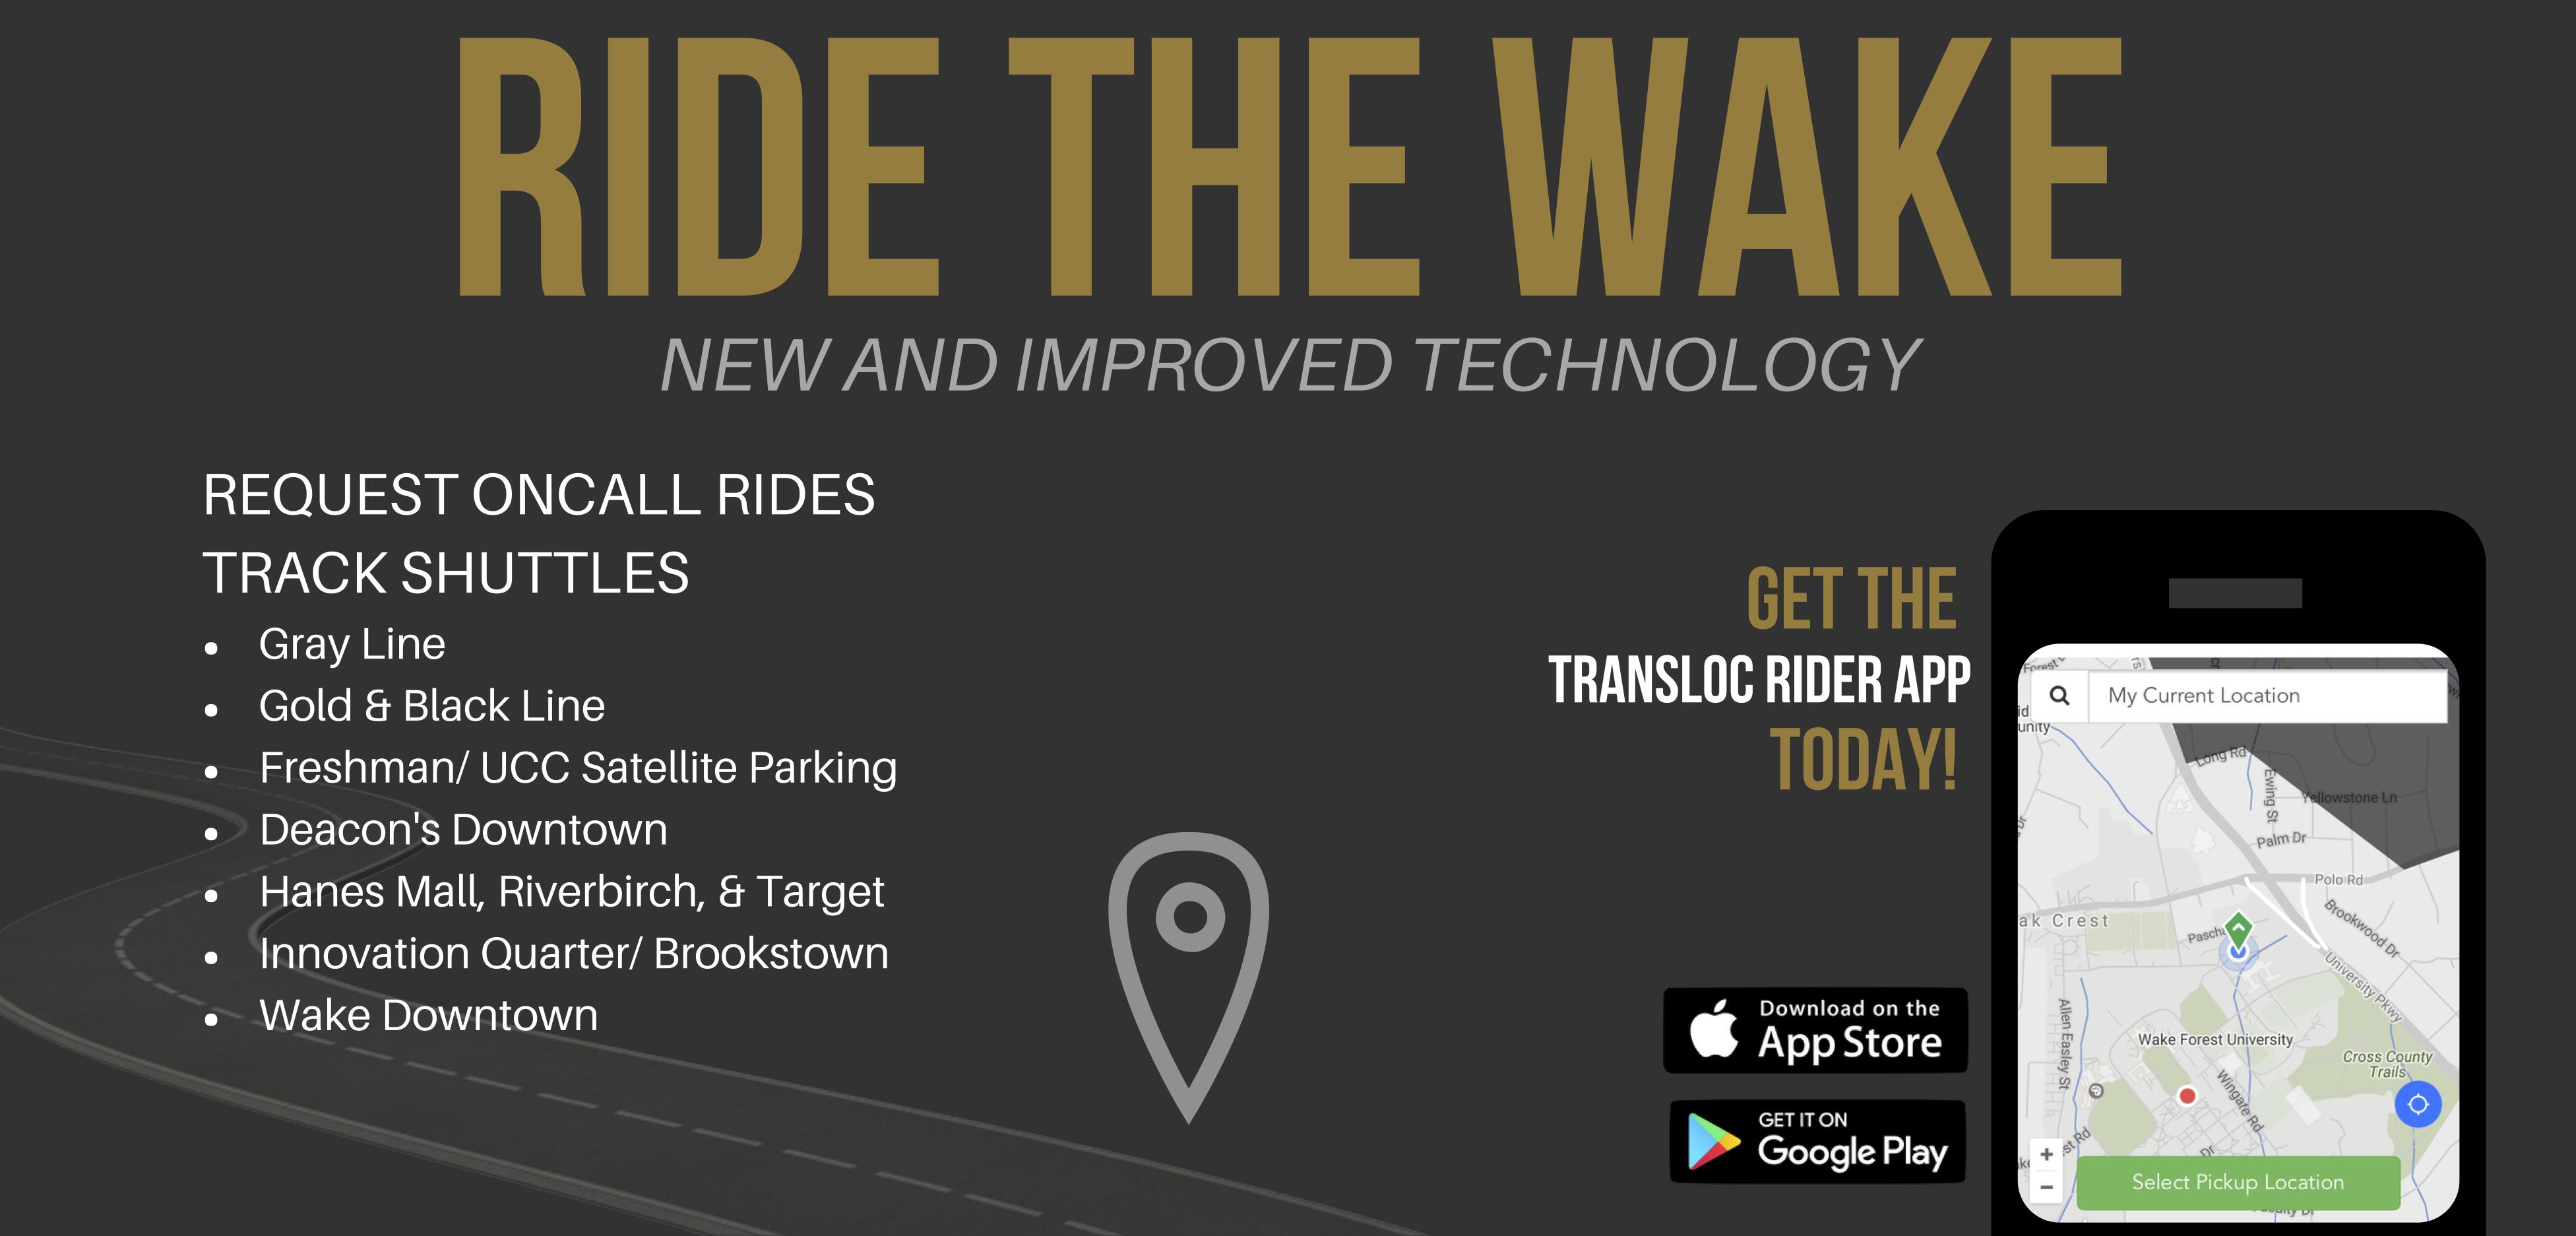 Ride The Wake Advertisement